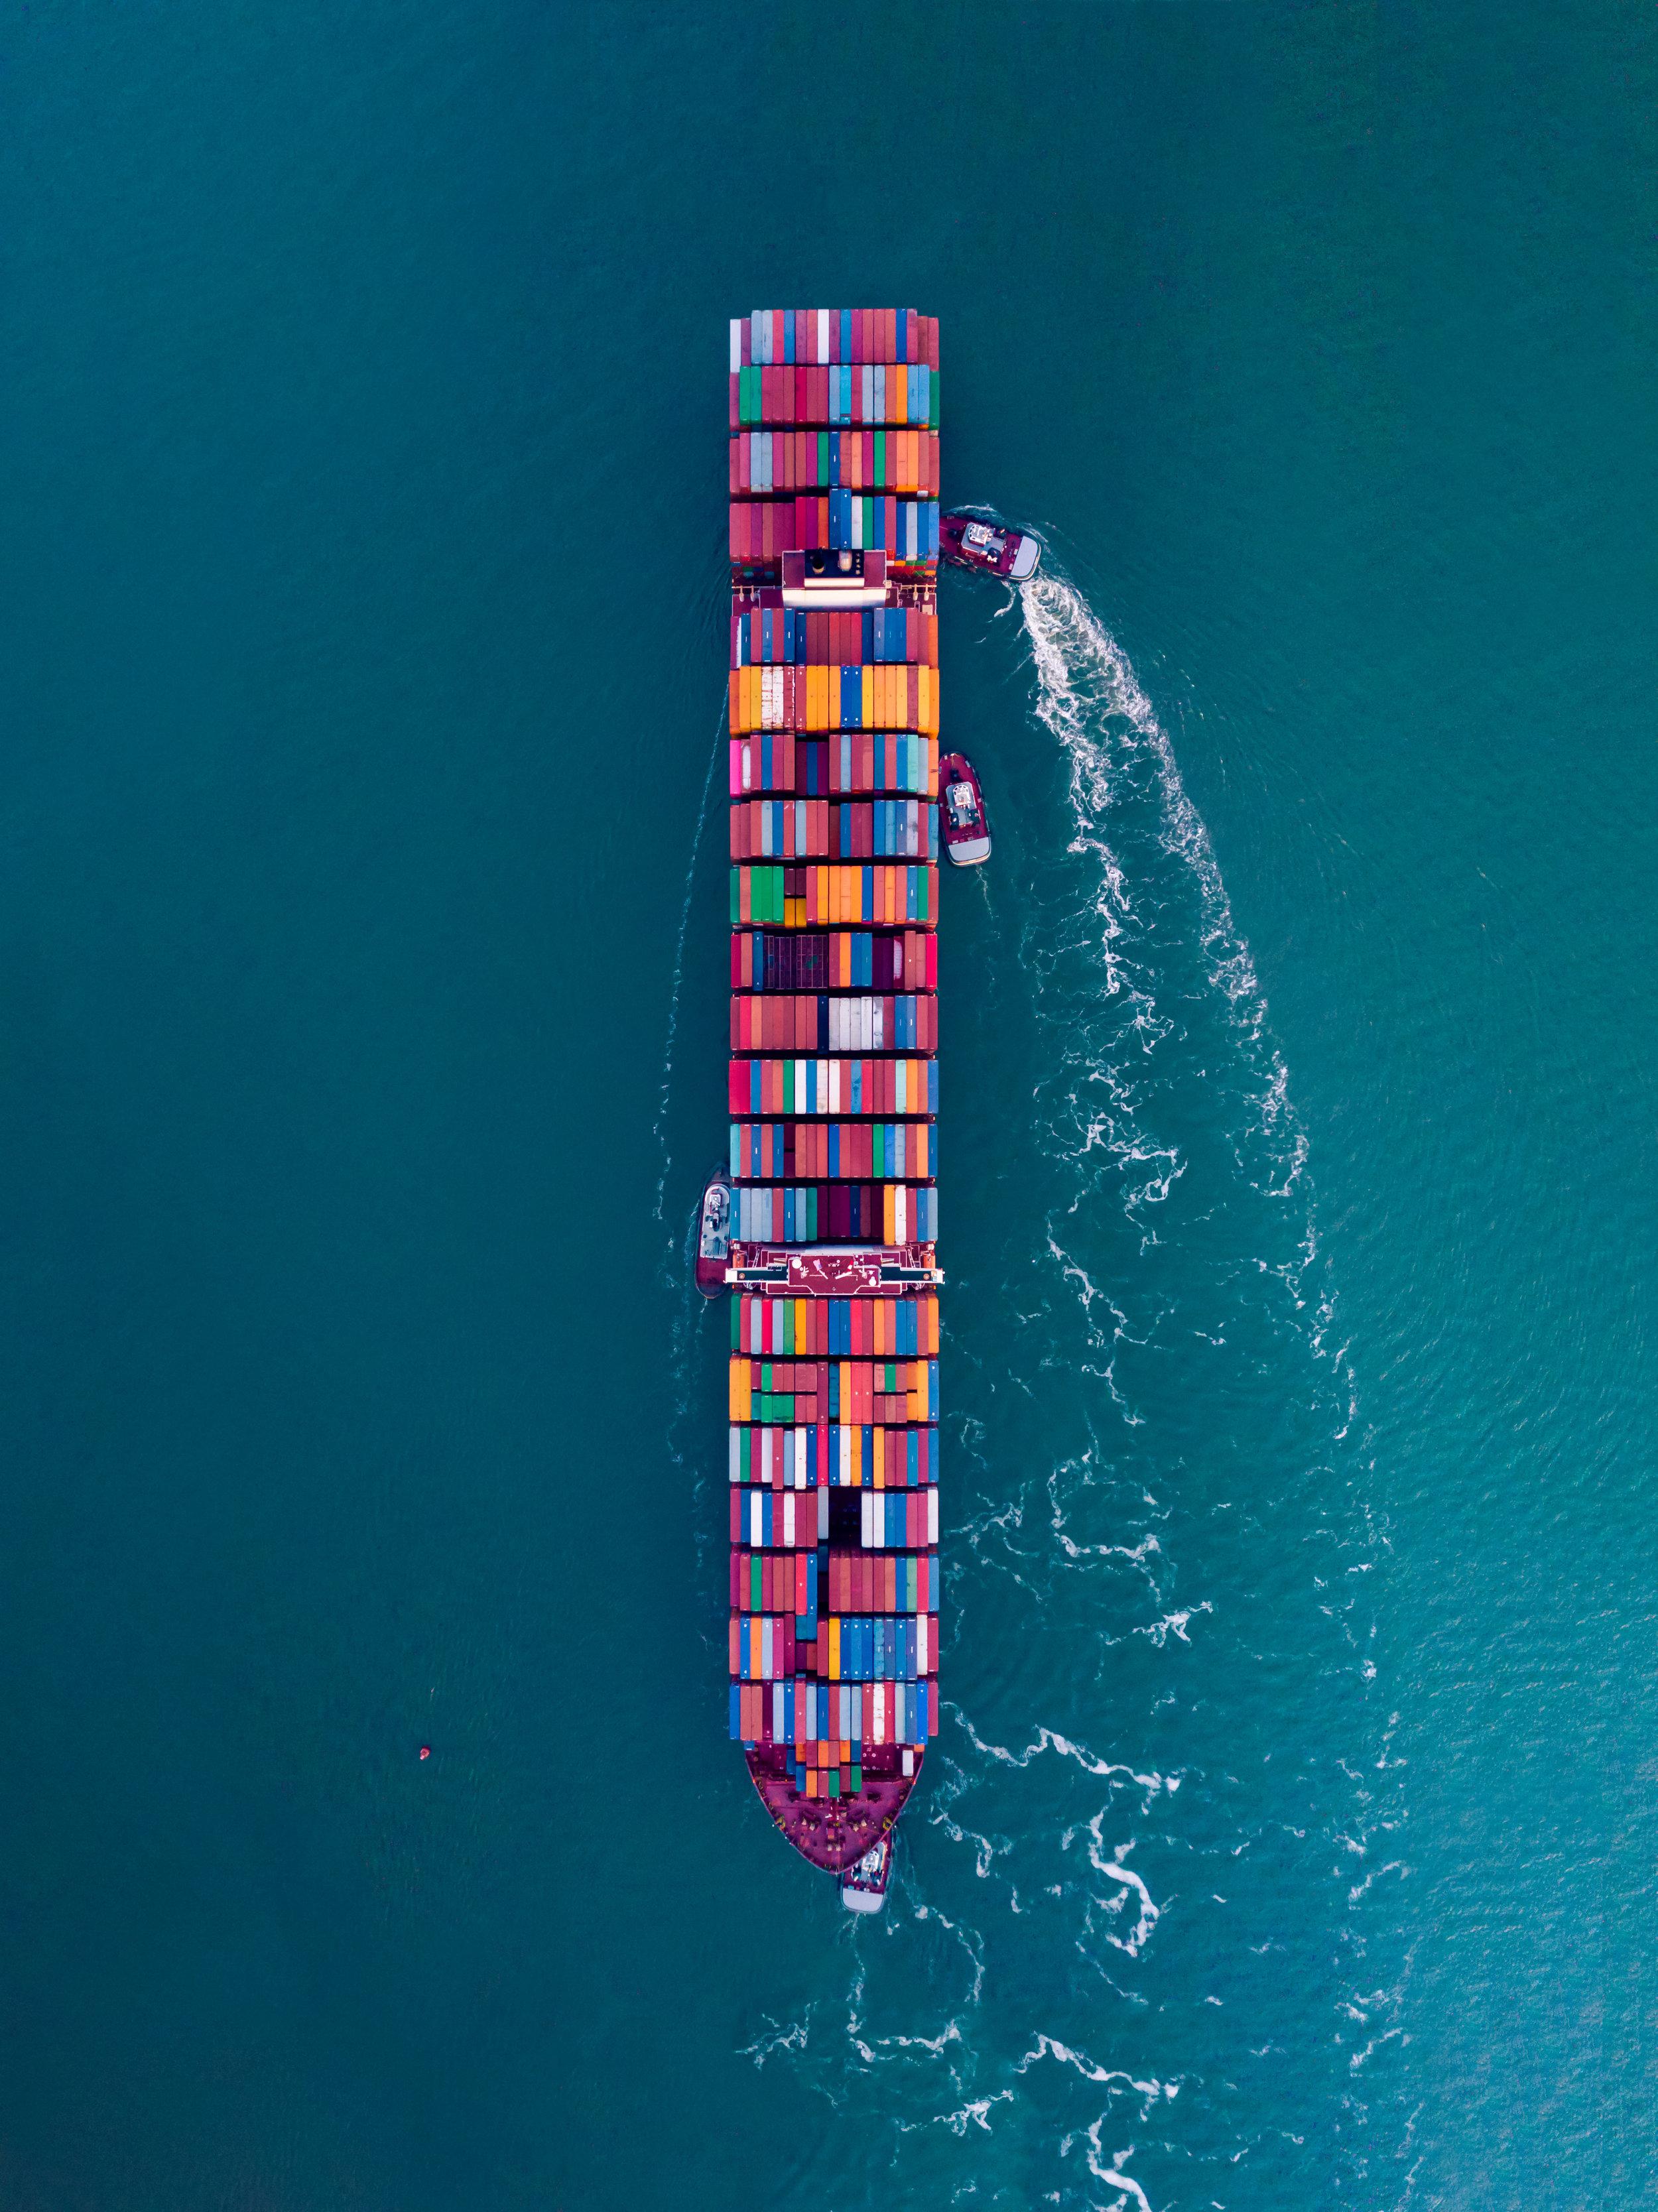 ContainerShip_typoland_portrait.jpg